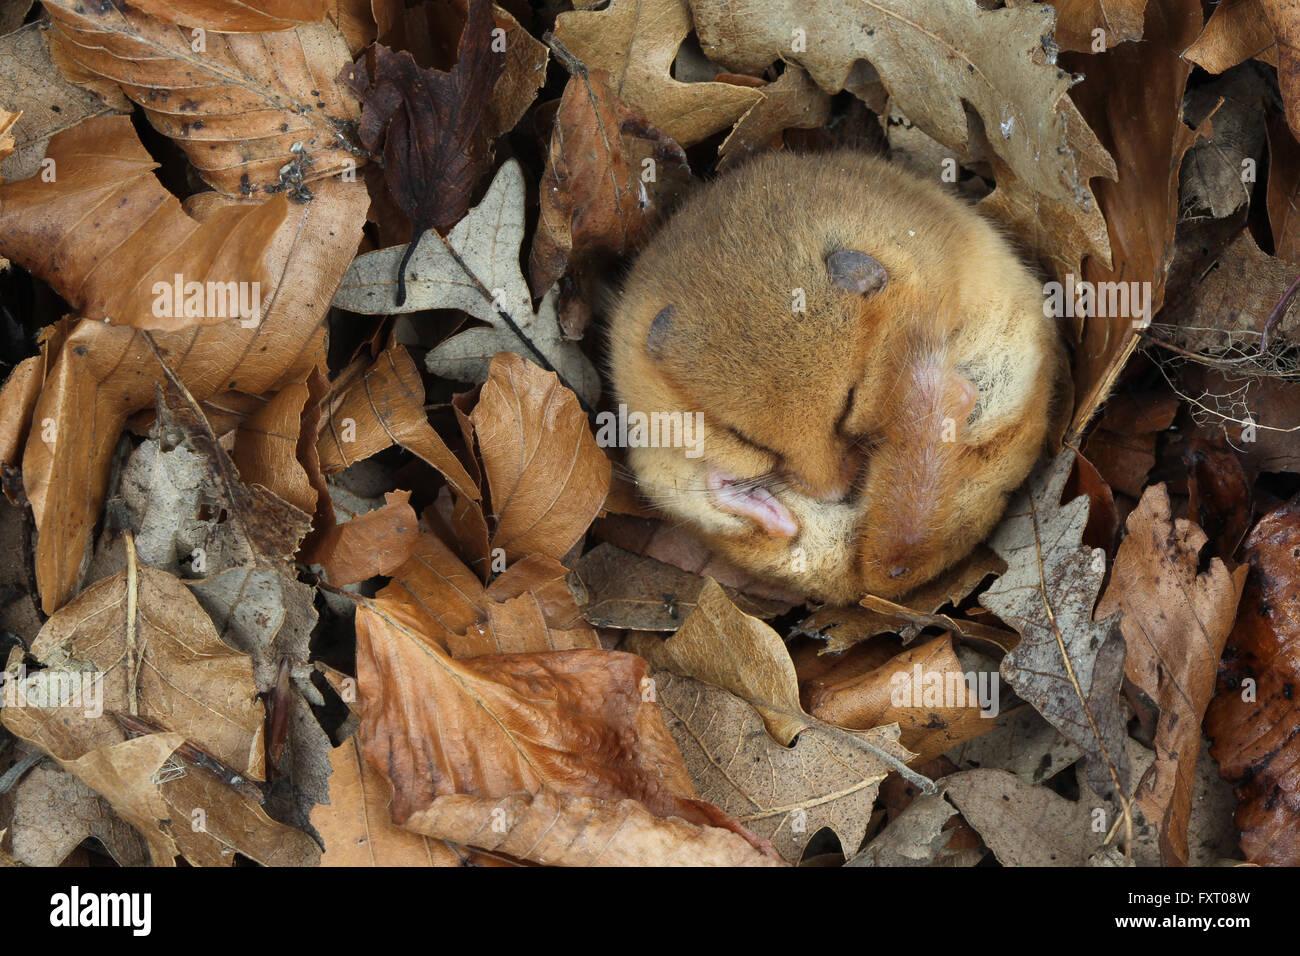 Dormouse sleeping in leaves - Hazel dormouse, Muscardinus avellanarius - Stock Image